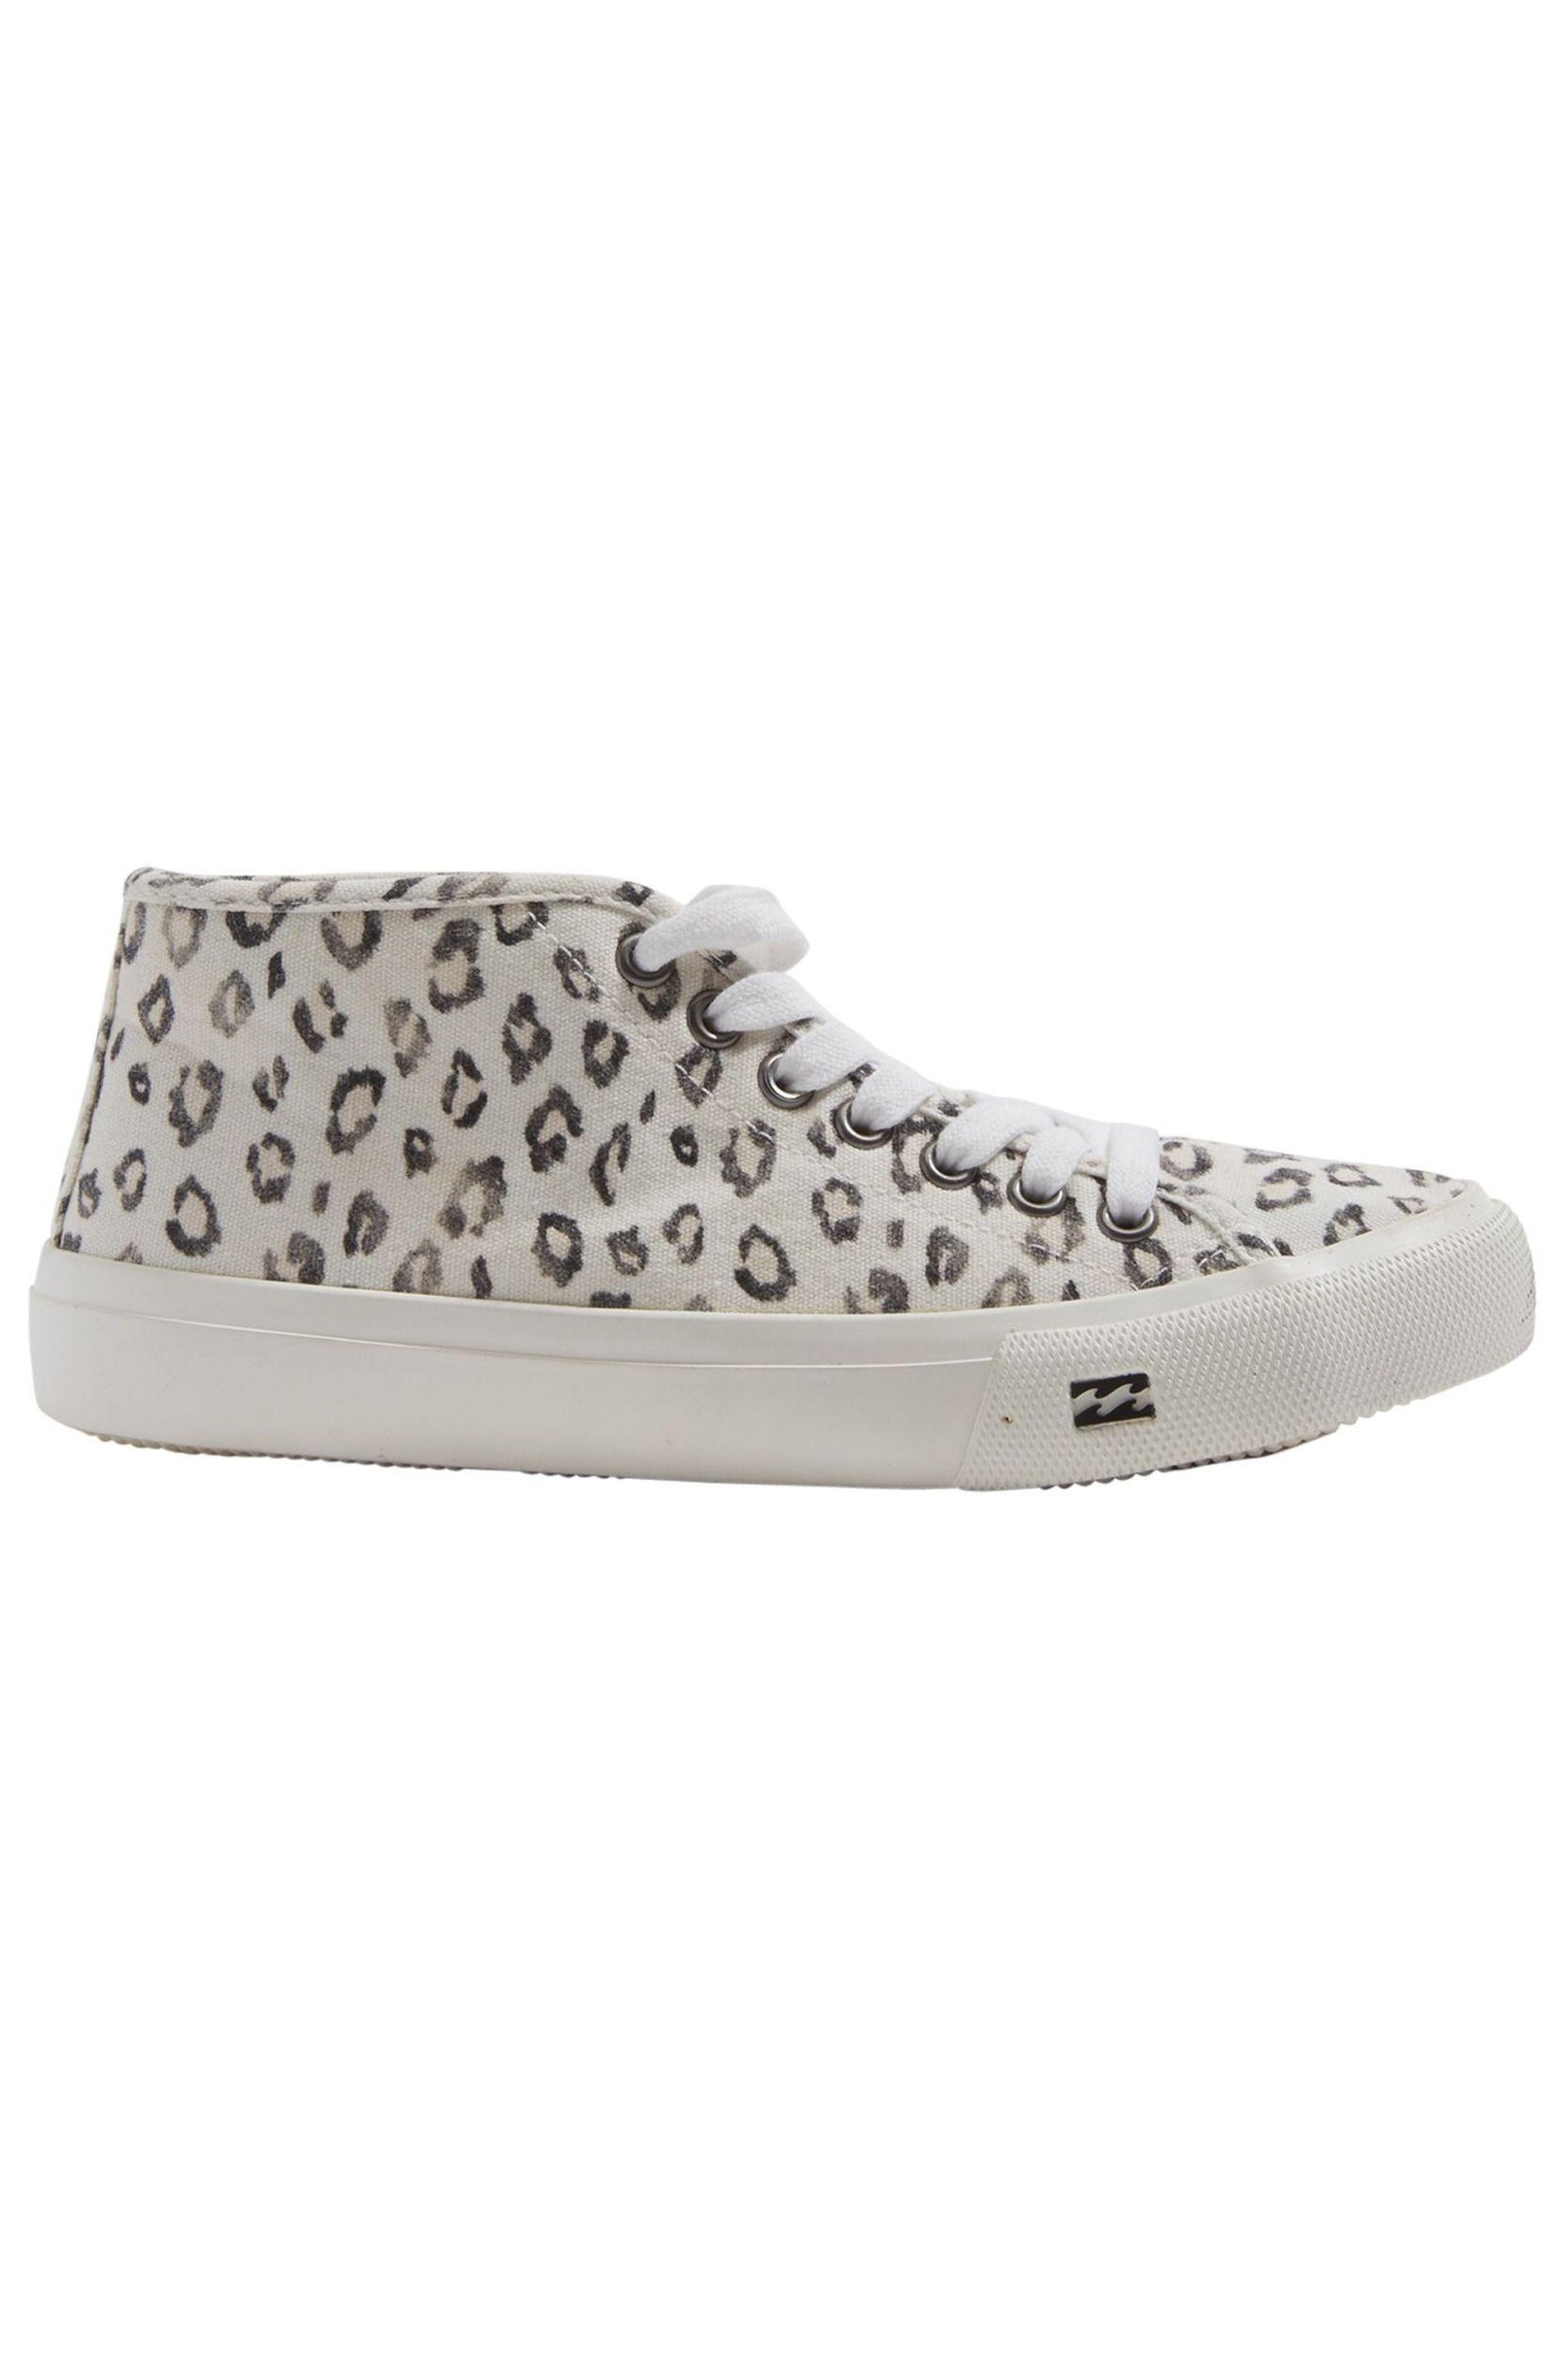 Billabong Shoes LA PLAYA SALTY BLONDE Animal